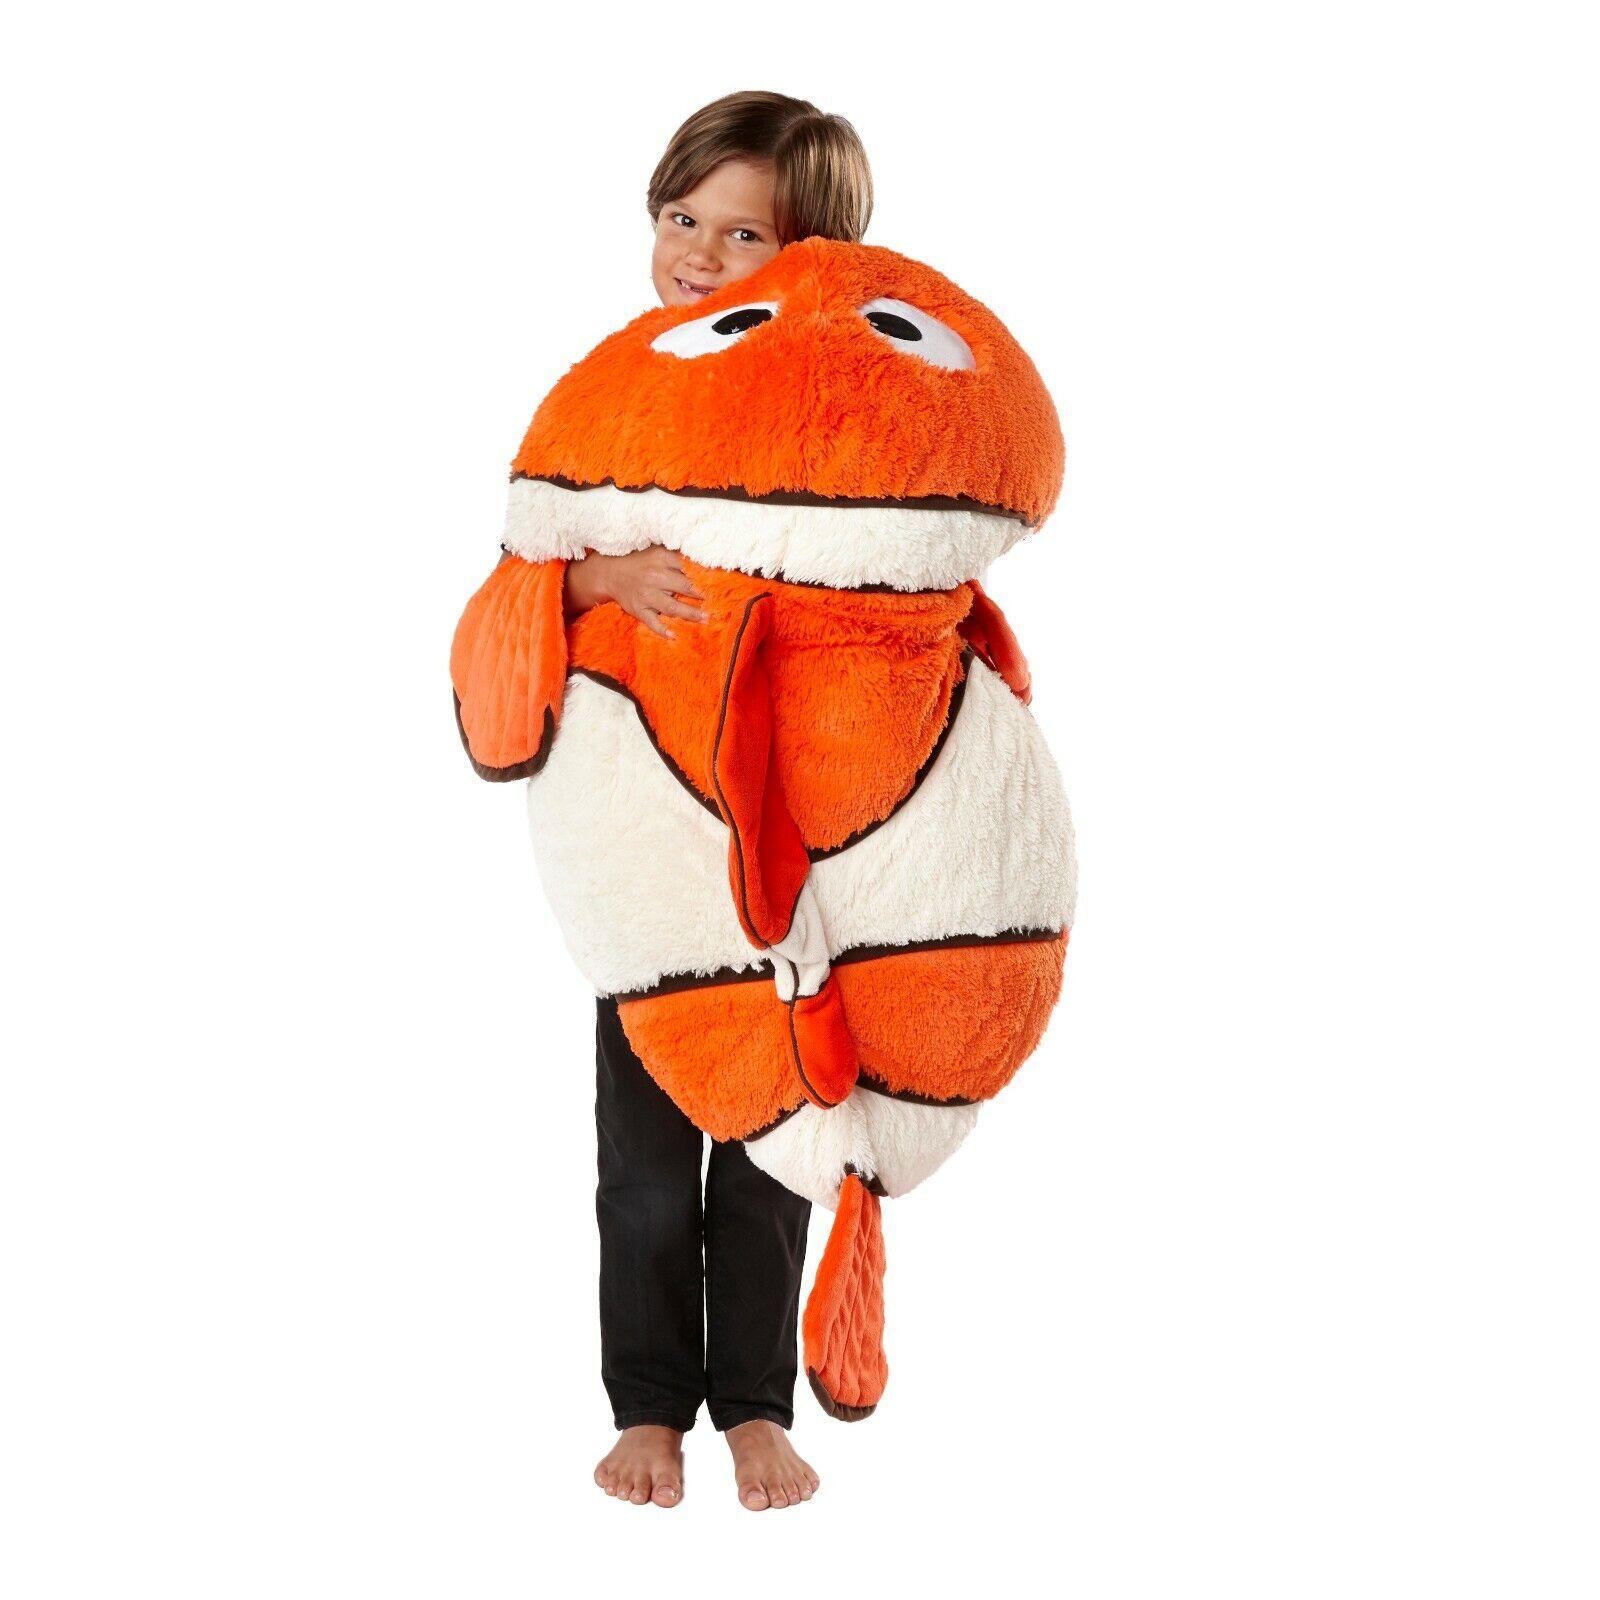 Finding Nemo Nemo 30 Jumbo Plush Pillow Pet